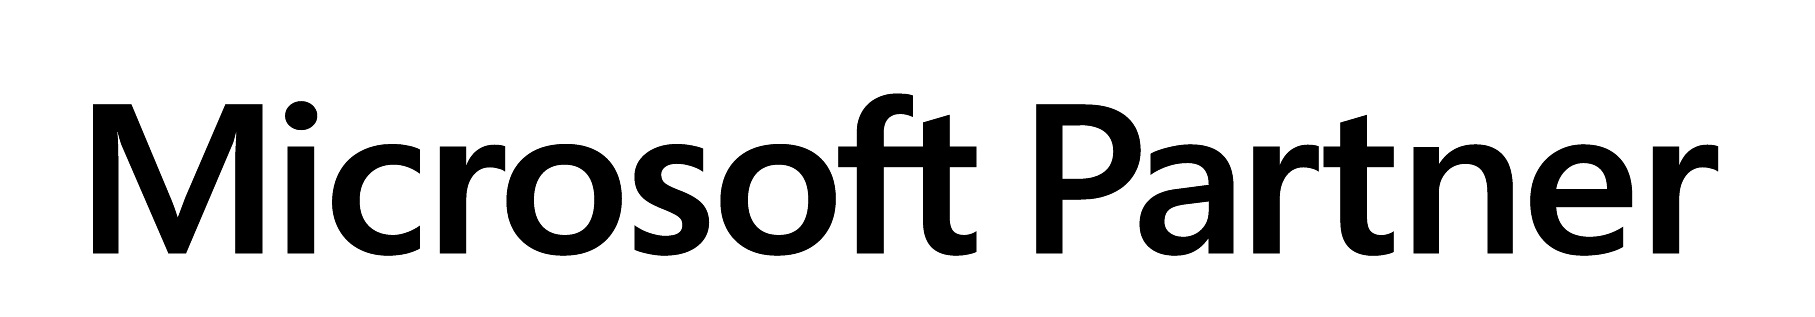 MS-Partner-logo.jpg